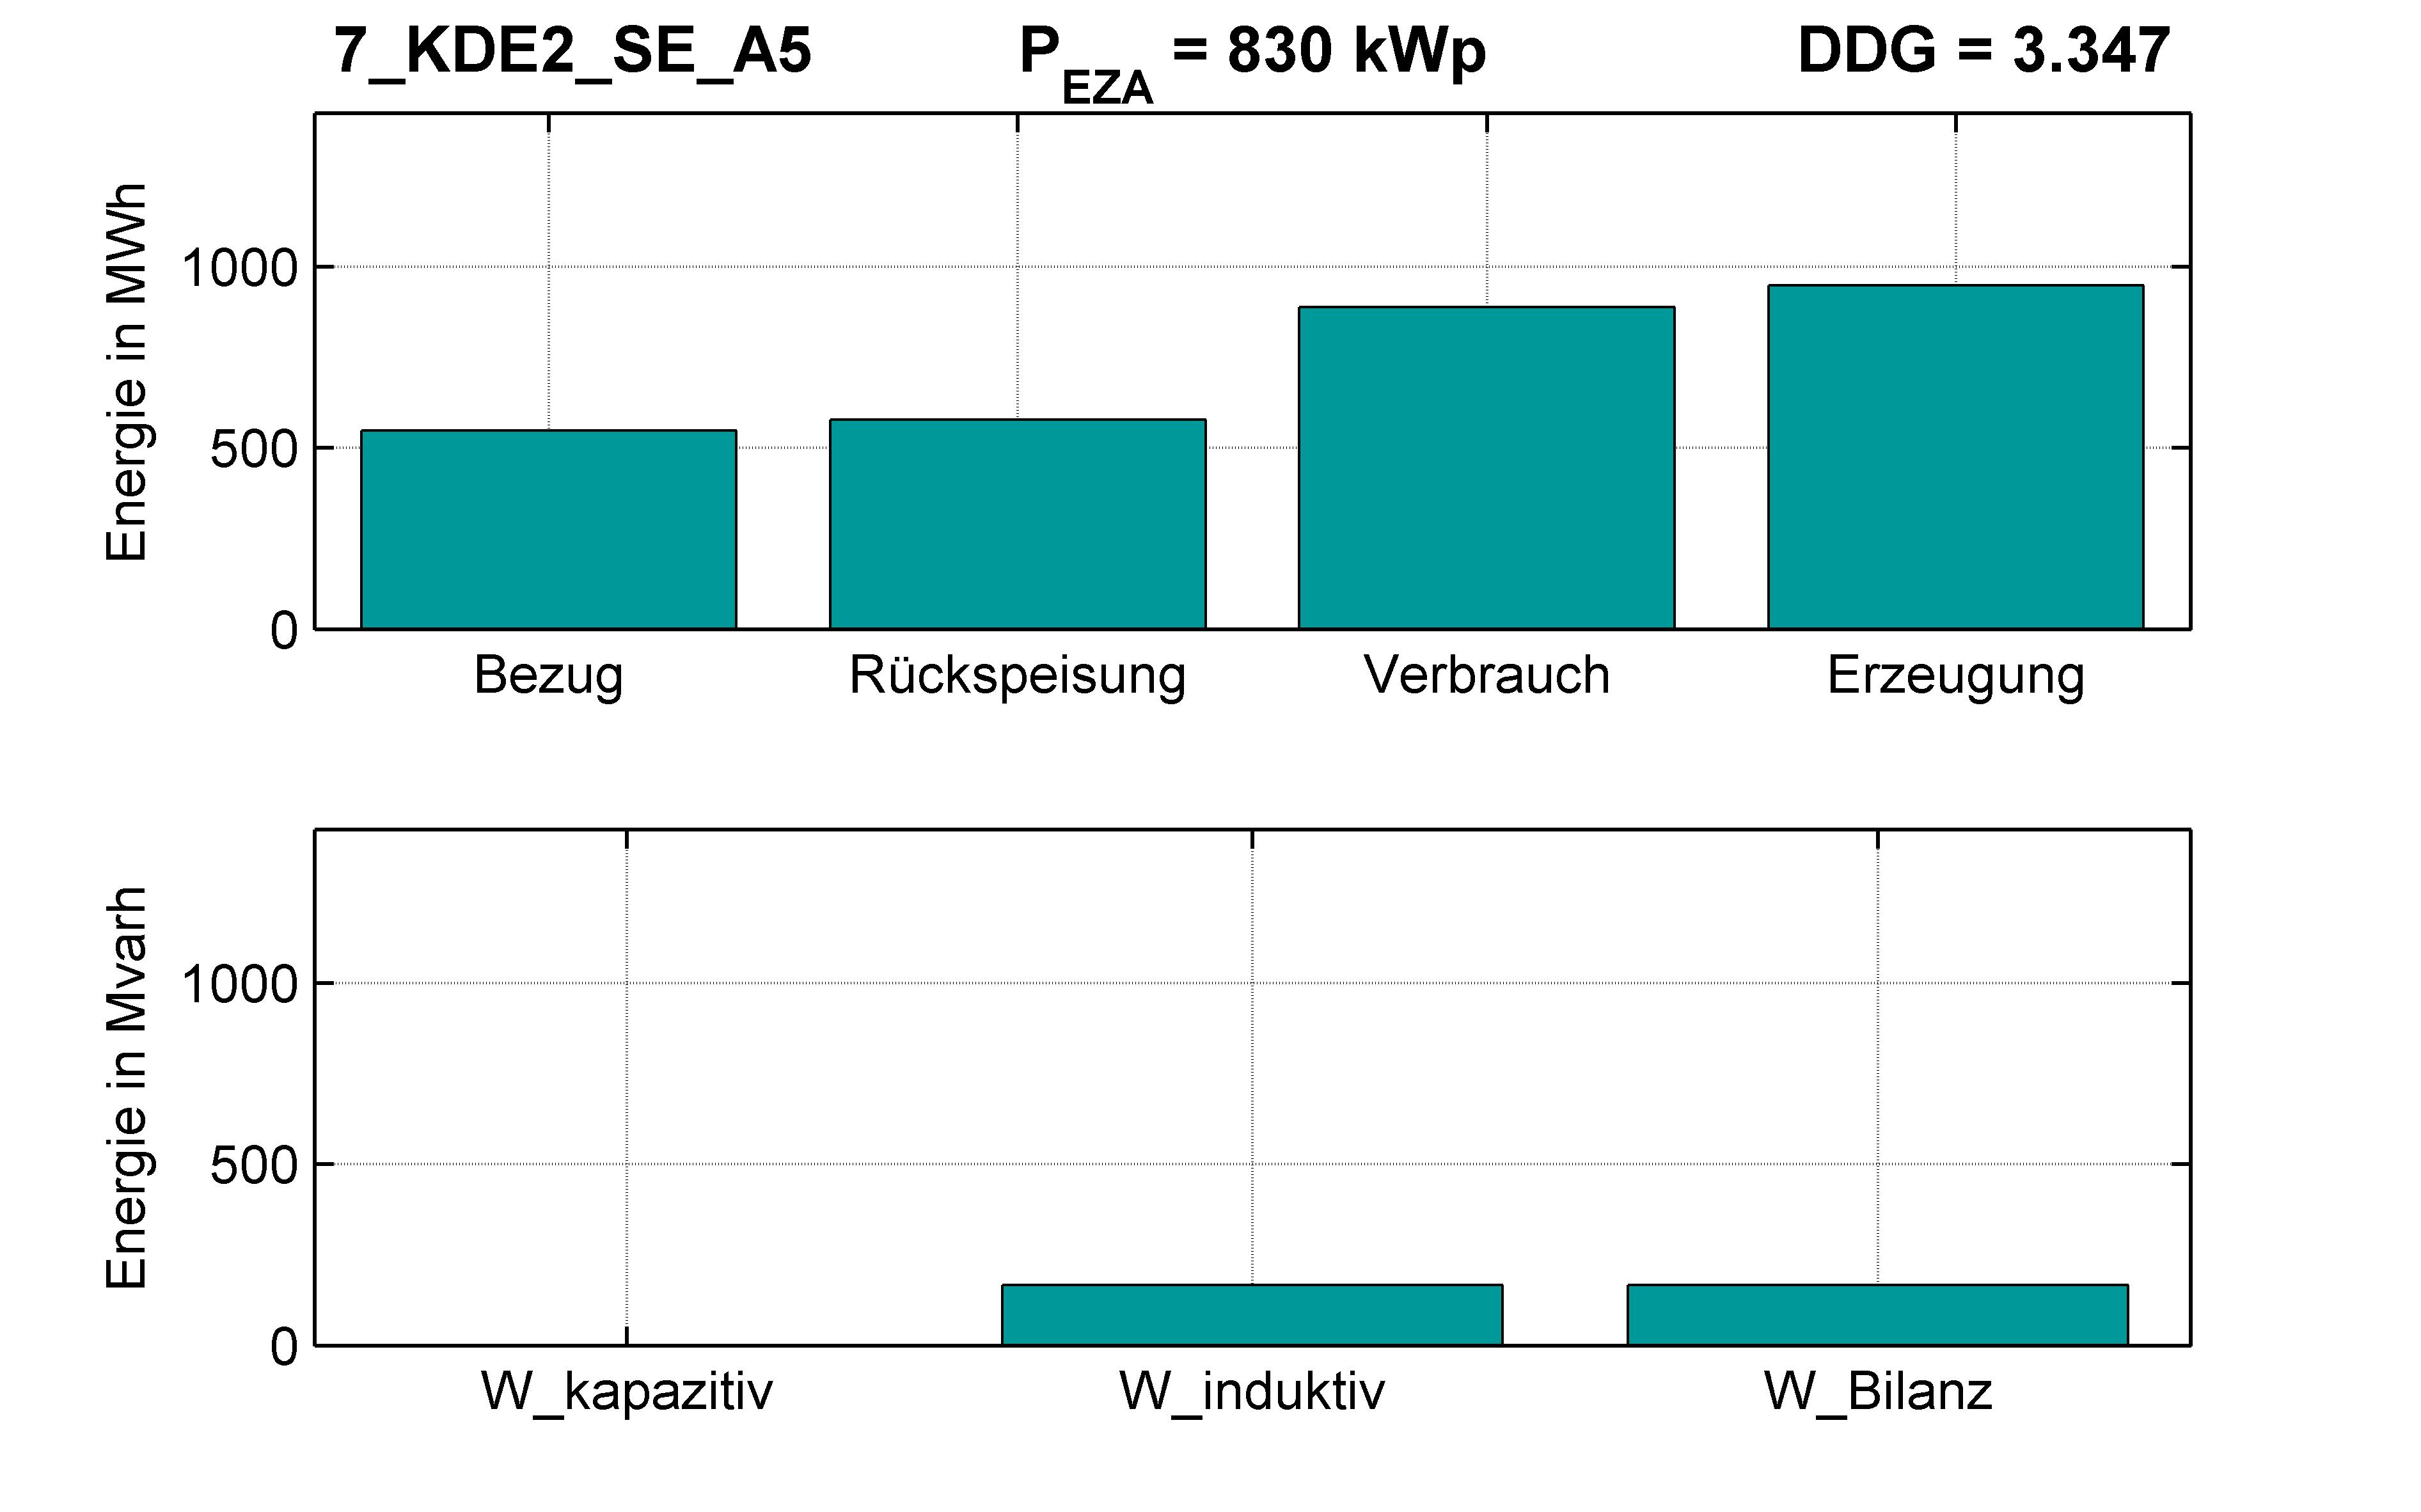 KDE2 | Längsregler (SE) A5 | PQ-Bilanz